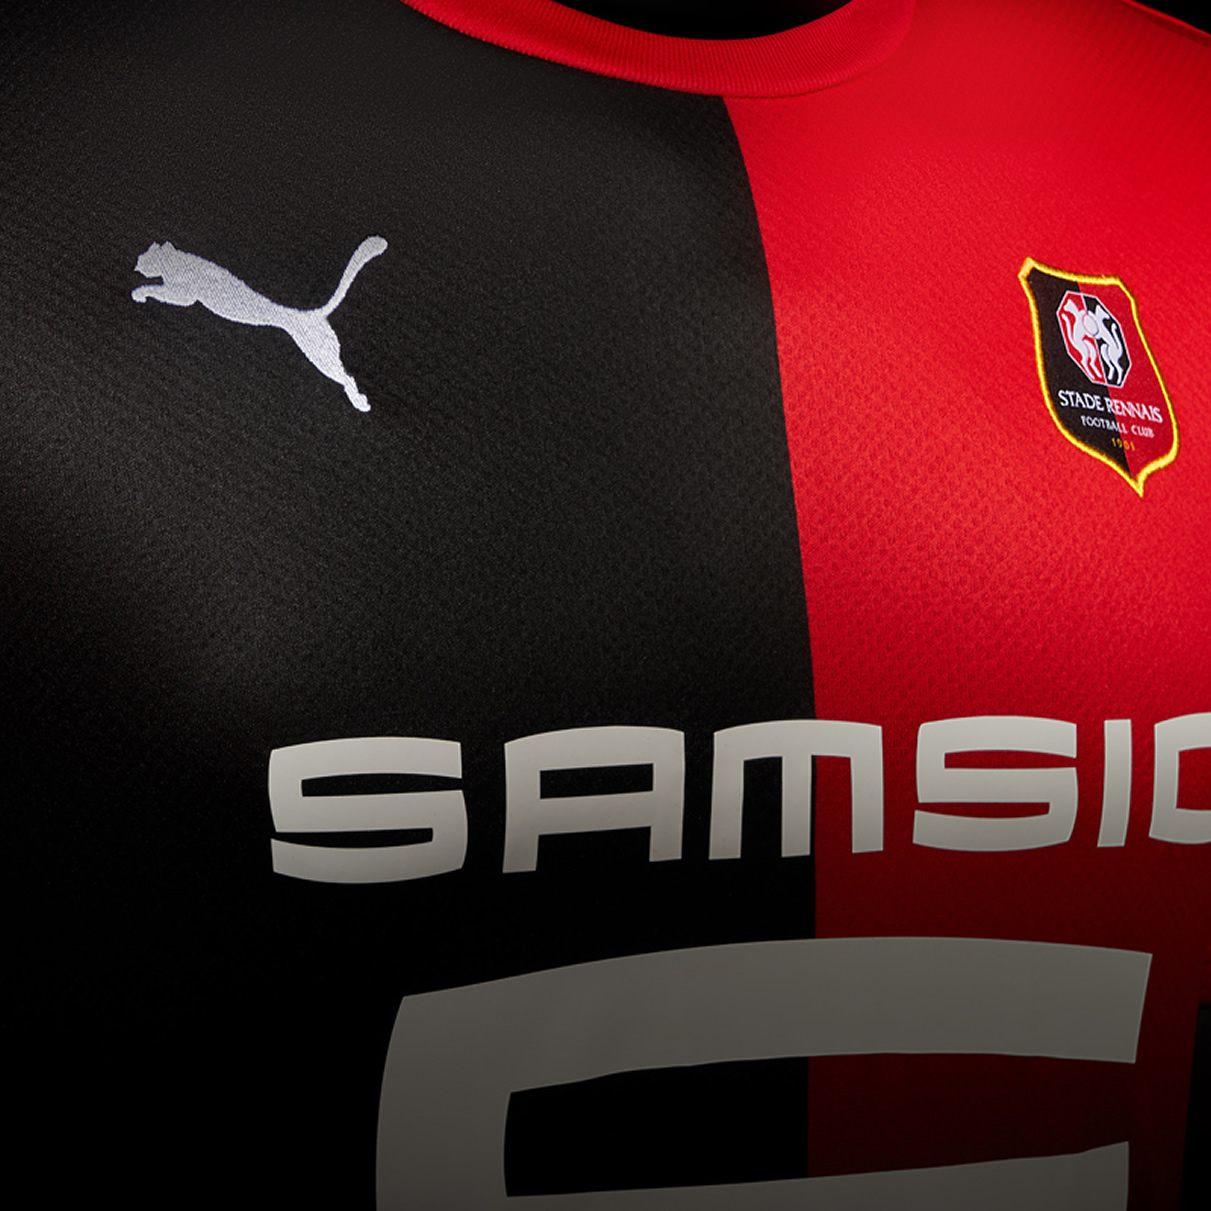 Camiseta Puma del Stade Rennais 2019/20 | Imagen Web Oficial